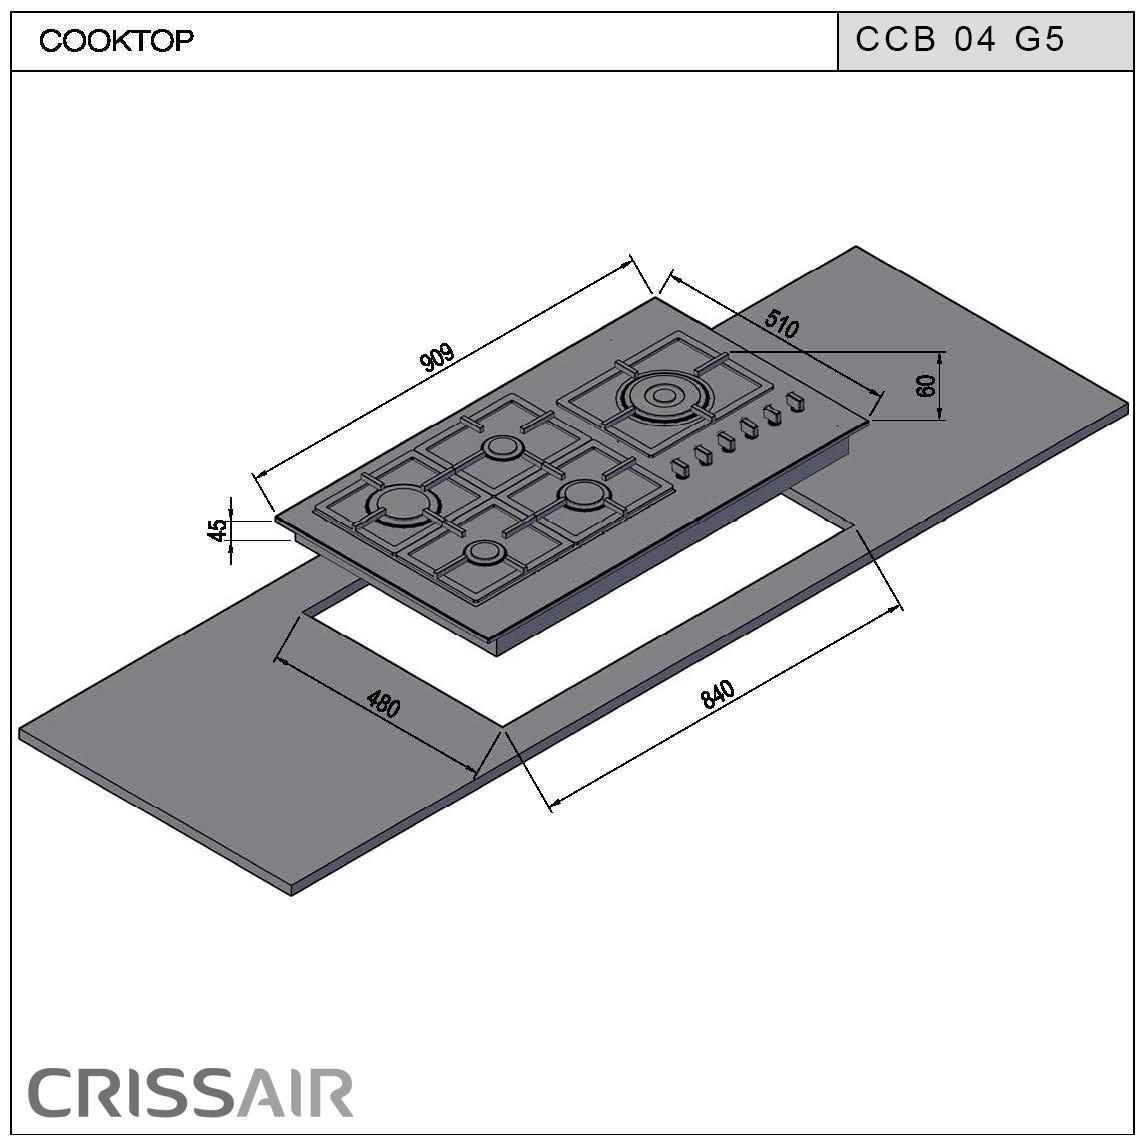 Cooktop a Gás CCB 04 G5